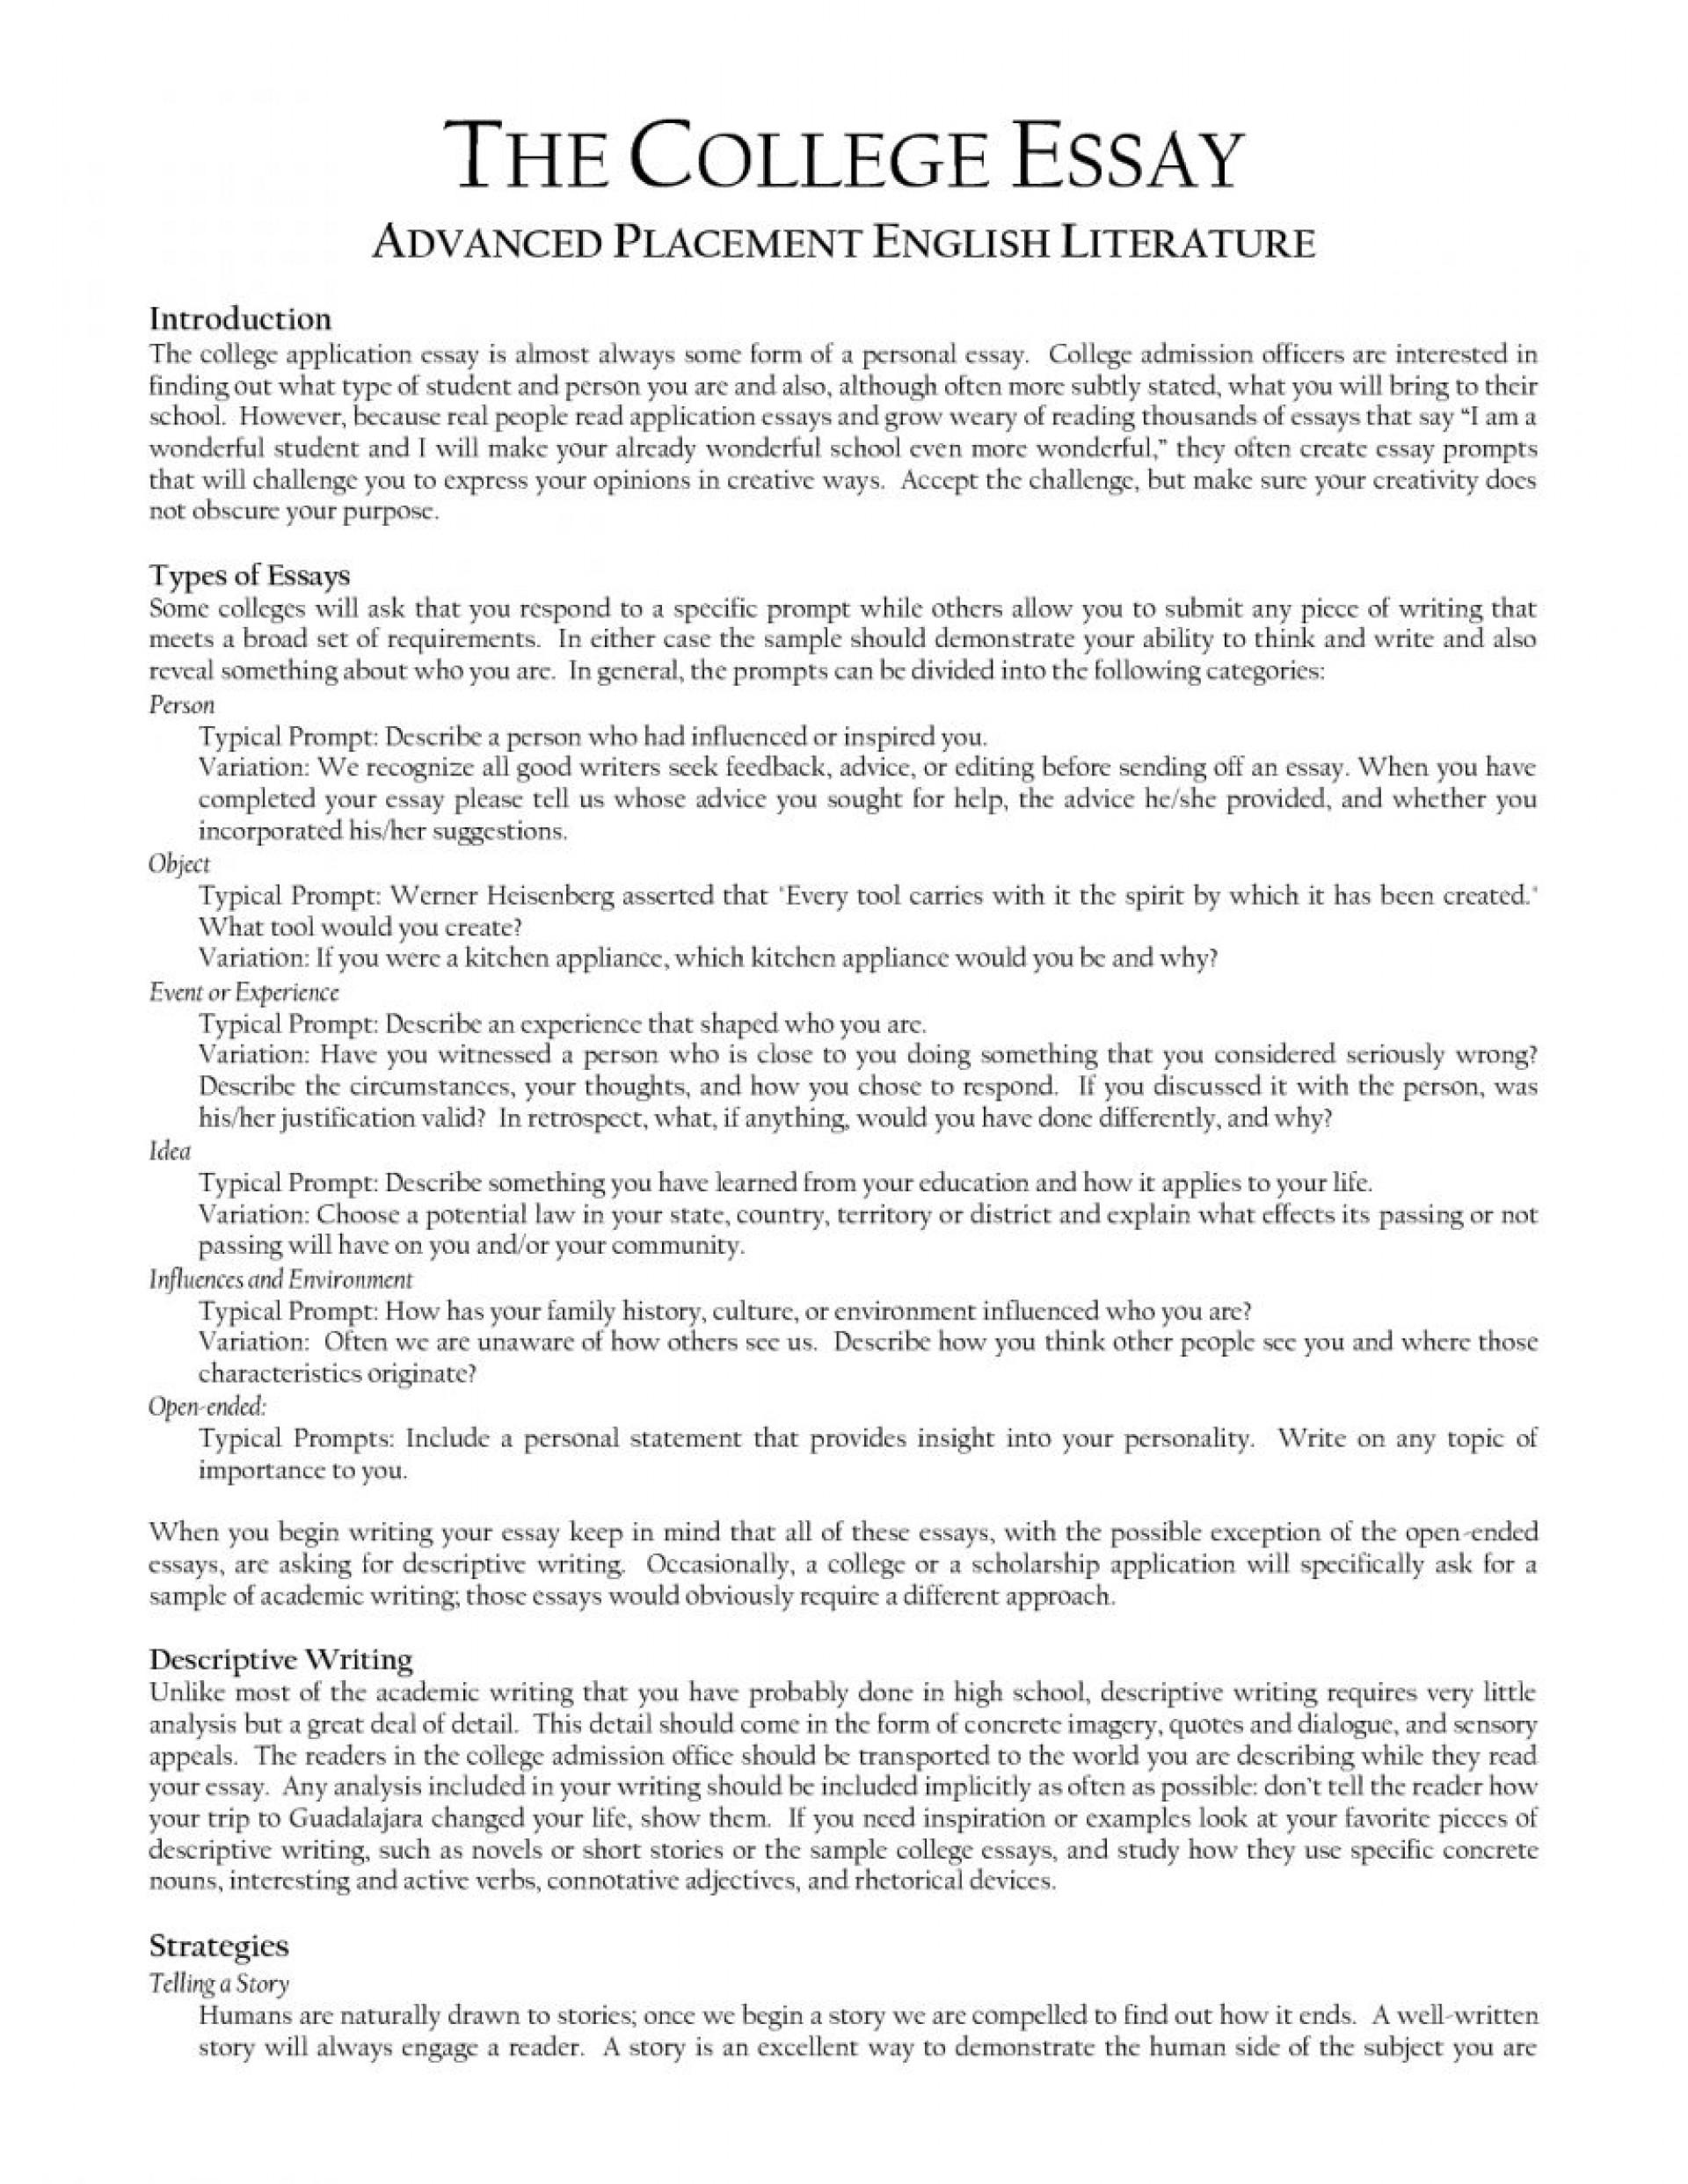 Longitudinal case study design